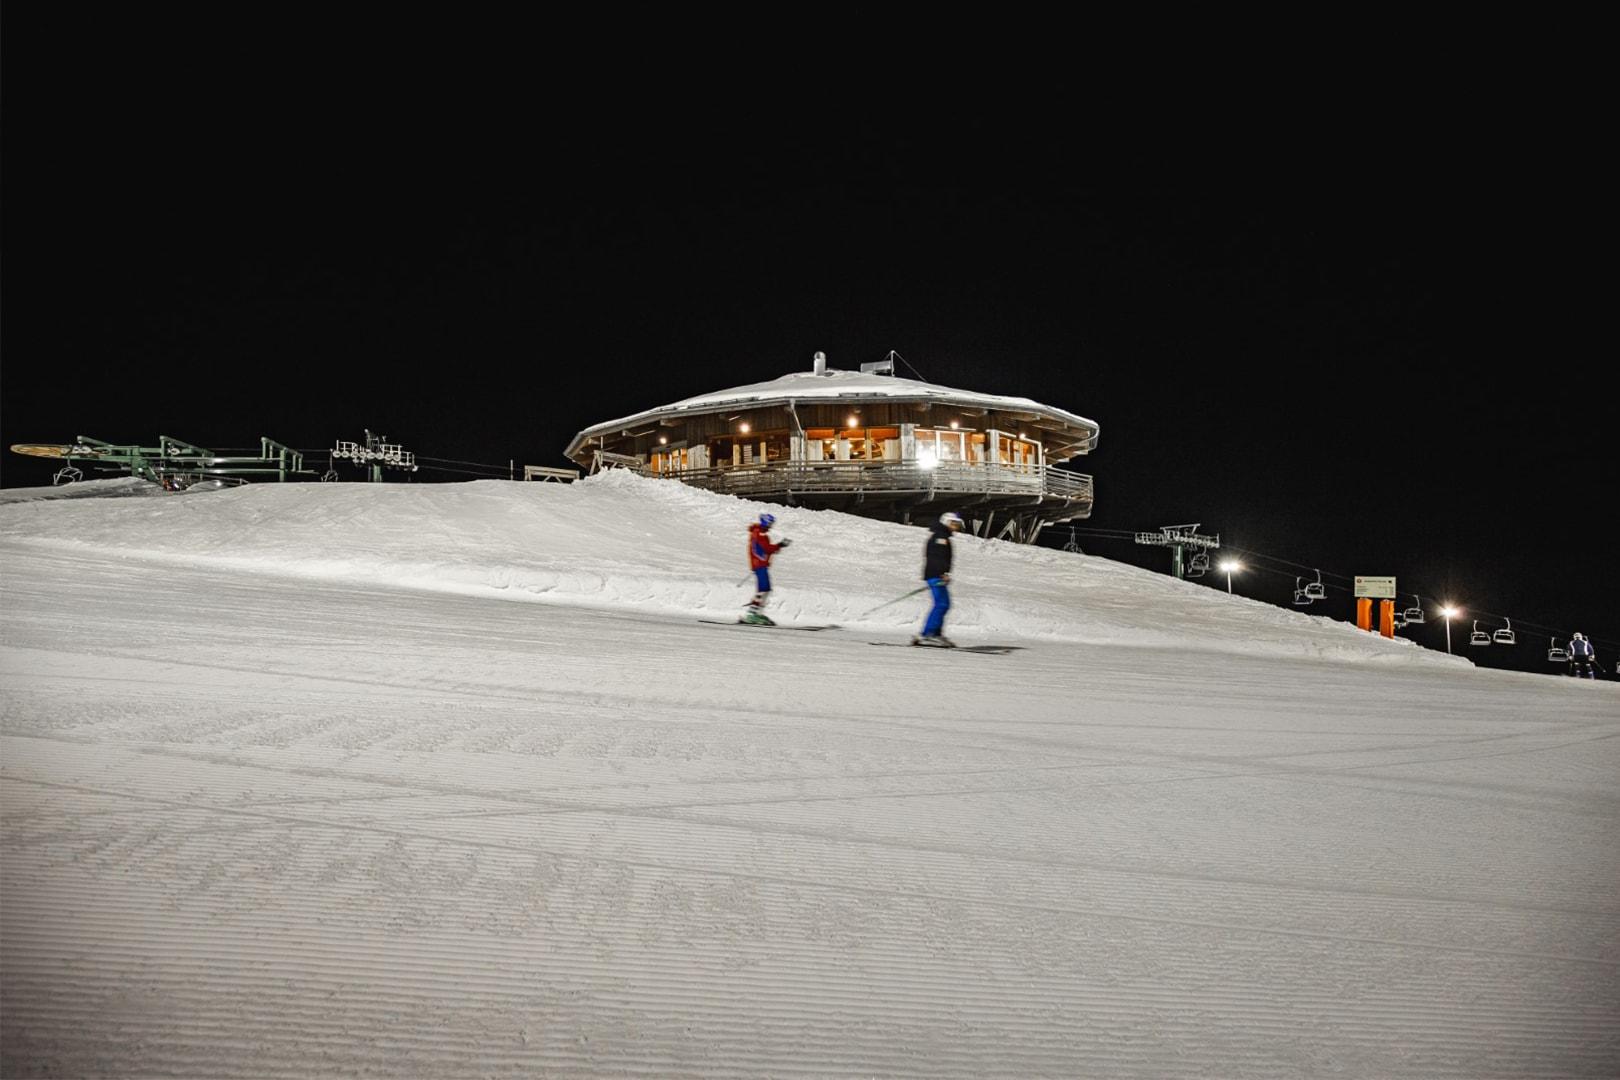 ski area Funivie Lagorai a Passo Brocon 2